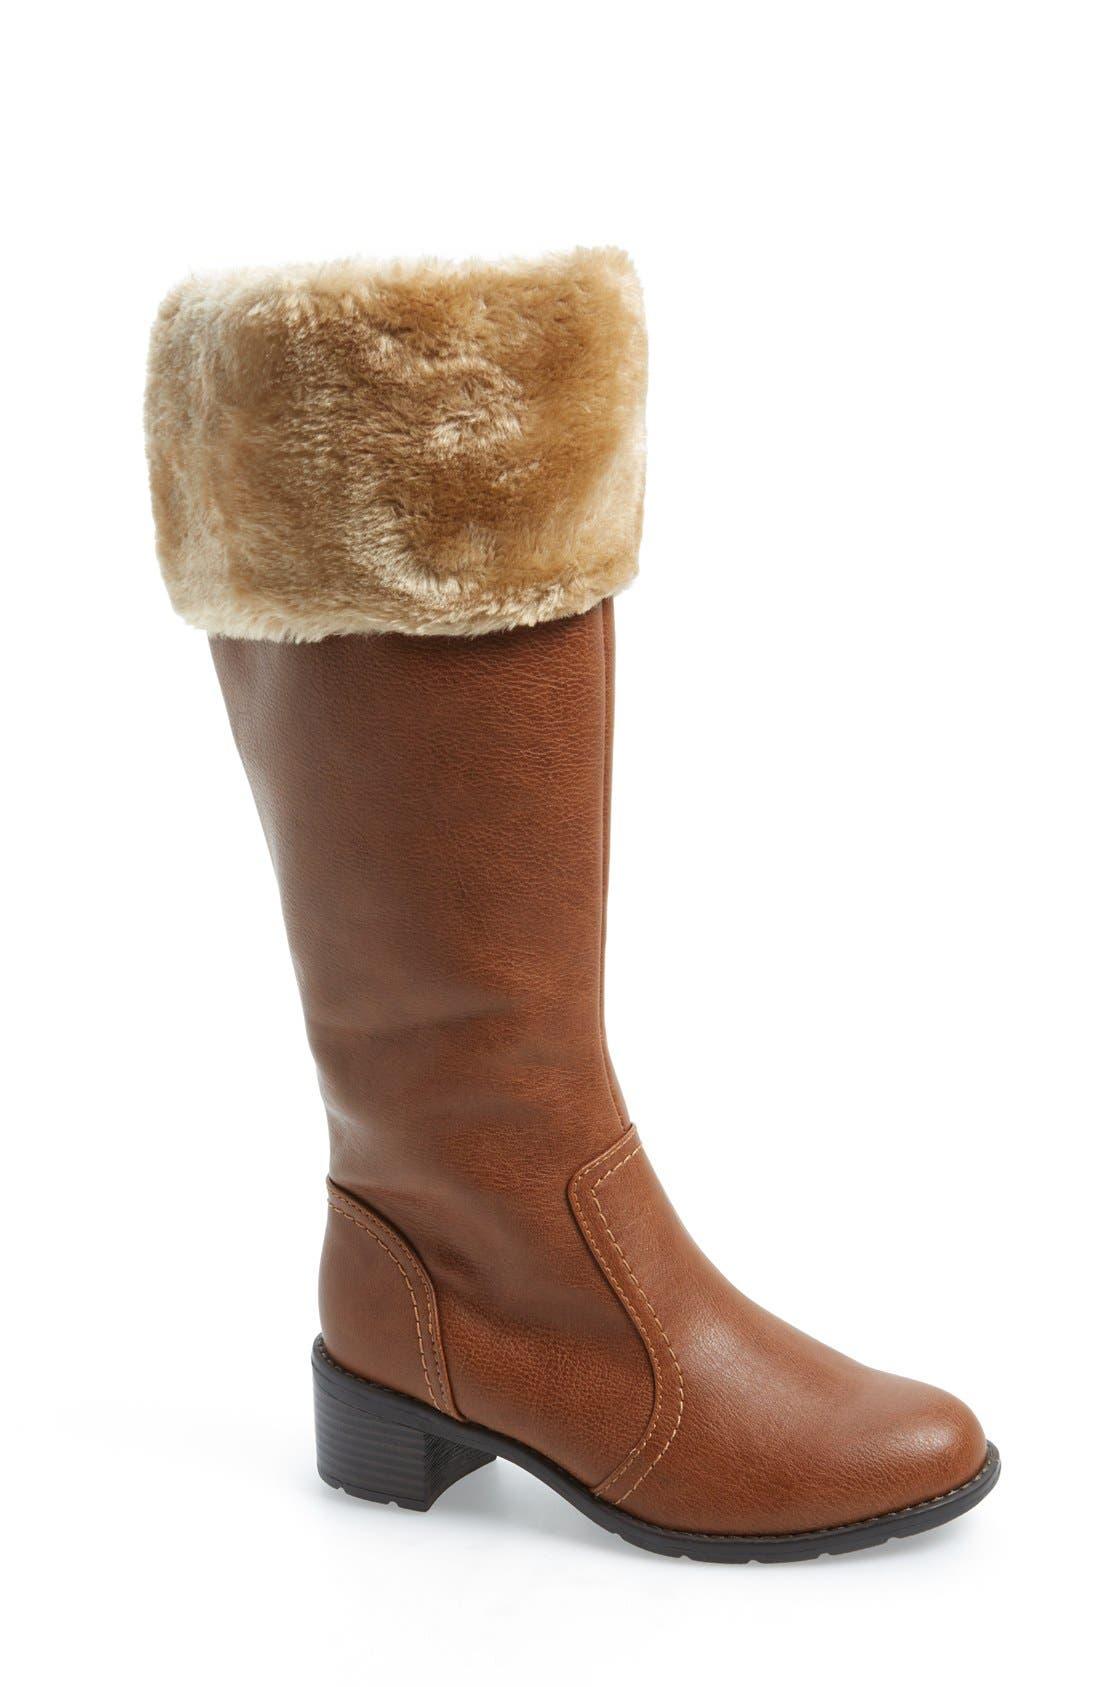 Main Image - Softspots'Campbell' Tall Boot (Women)